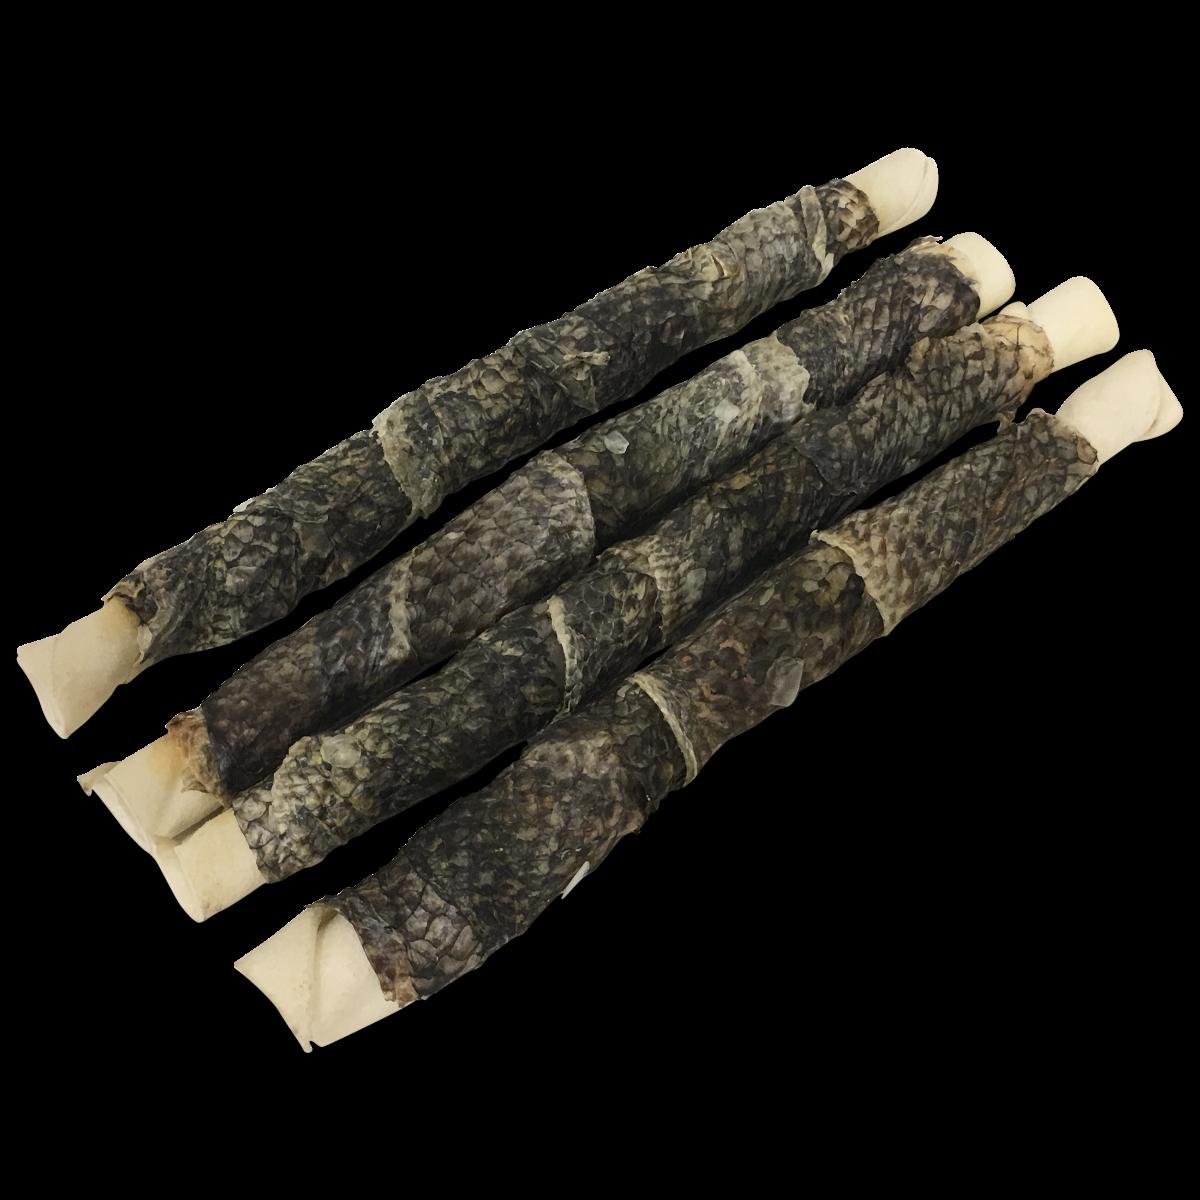 Rawhide (gedroogde runderhuid) omwikkeld met vis. Een ware delicatesse voor elke hond. Ook bestelbaar in andere maten/lengtes. Zak 400 gr. is ca. 4 stuks. Ingrediënten: 80% Runderhuid 20% Vis